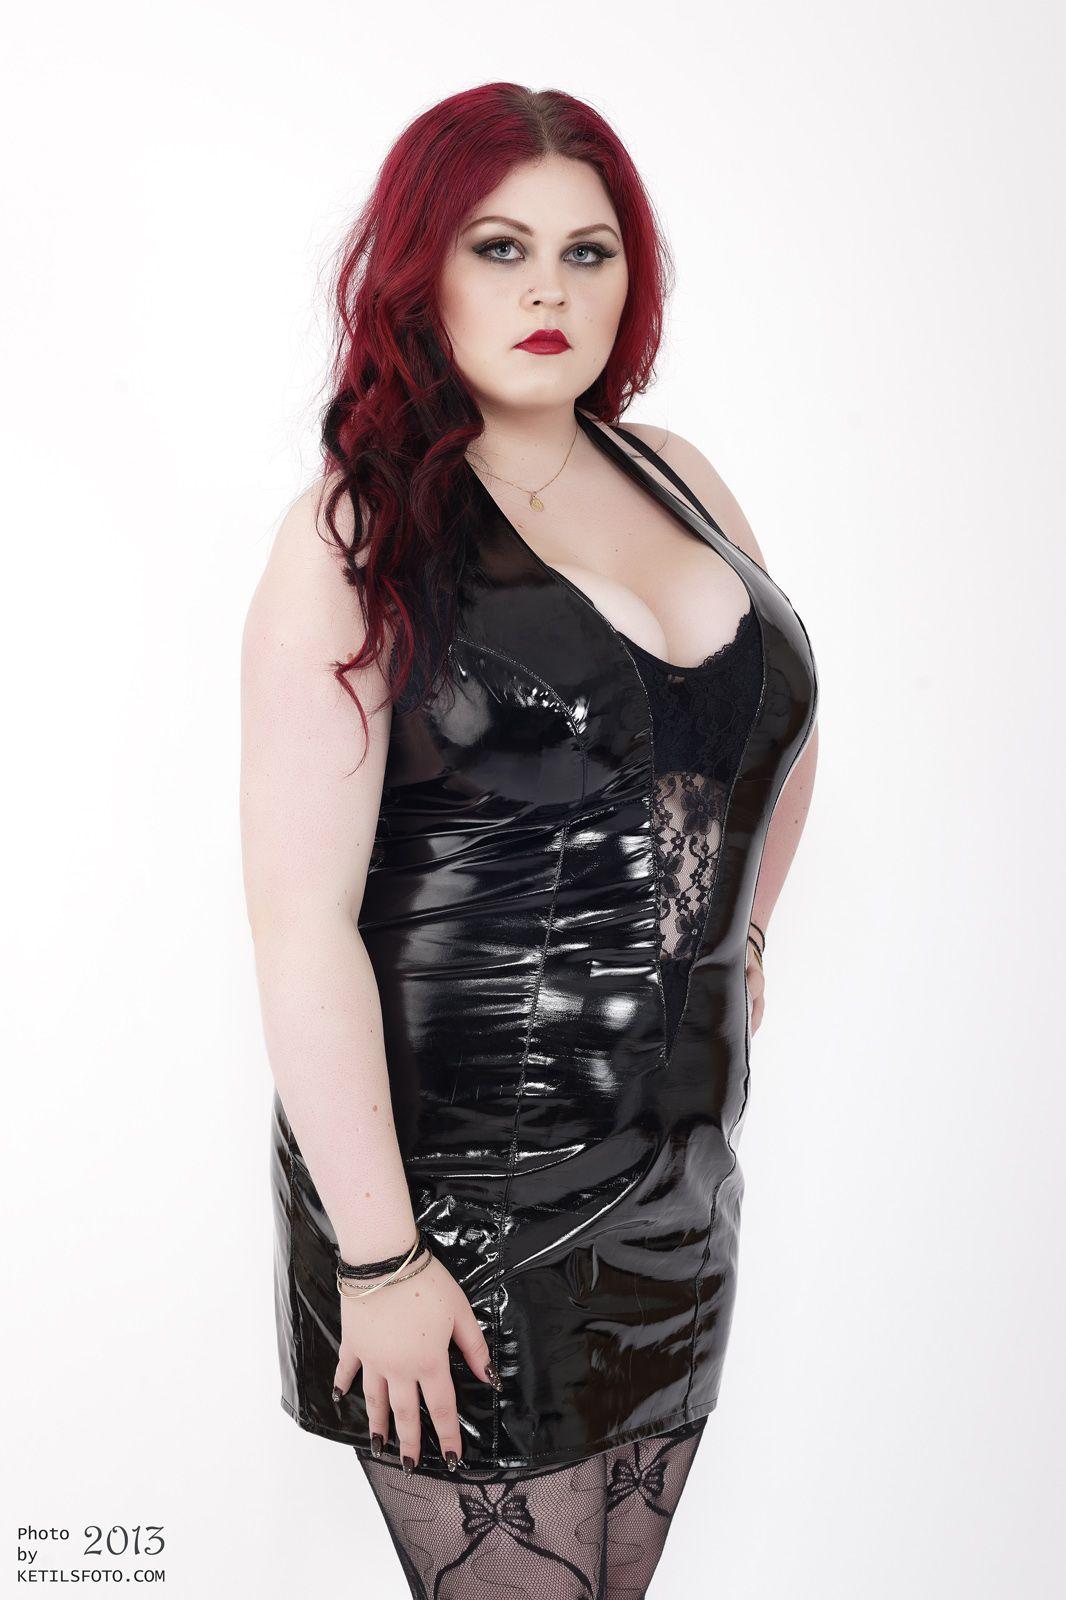 bbw pvc & latex | curvy women in latex, leather or pvc | pinterest